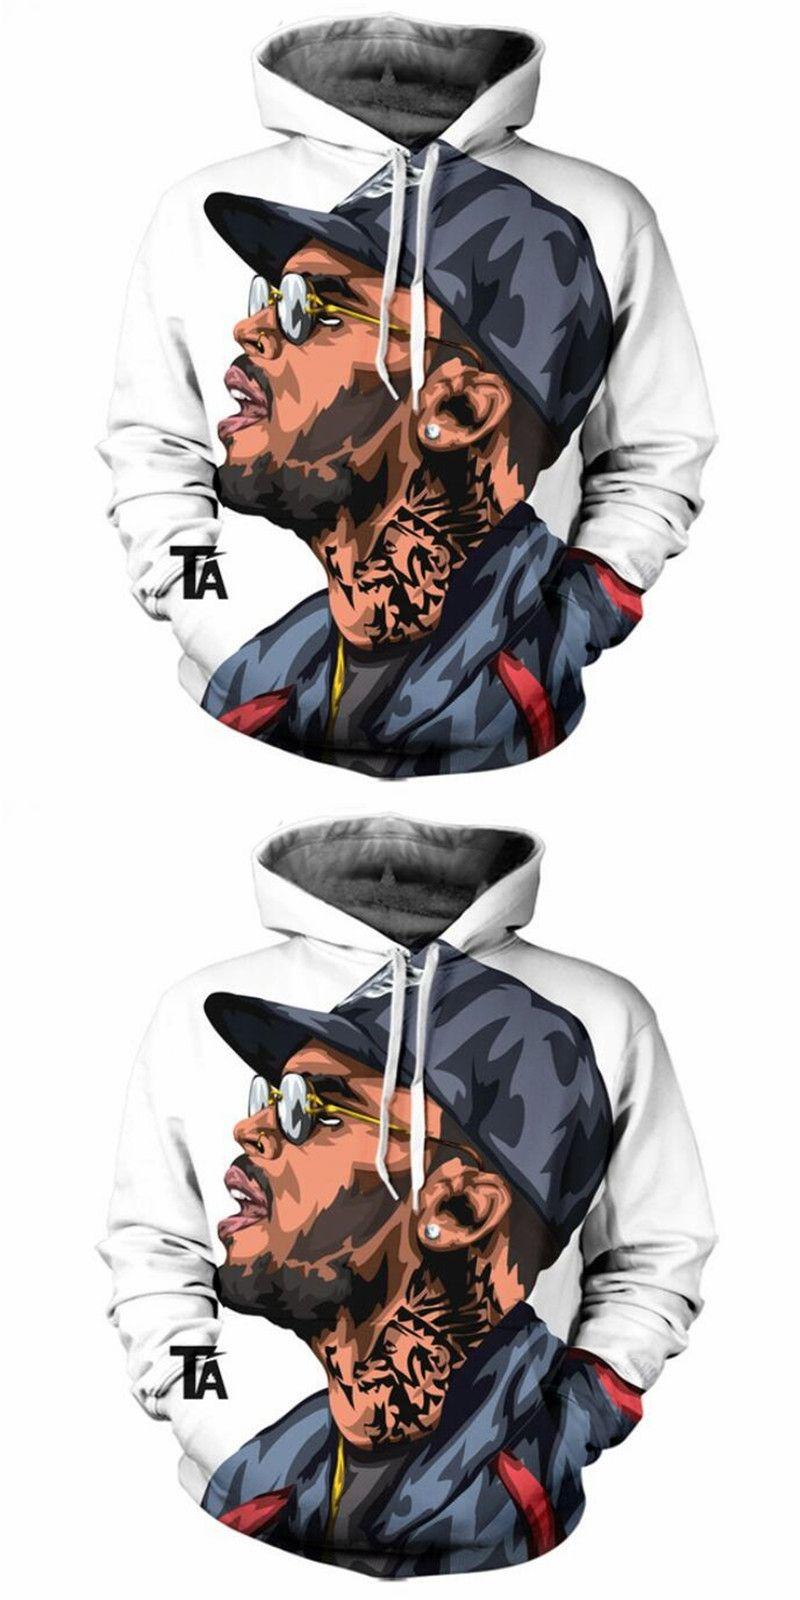 7244e834e0b 2017 new fashion Cool sweatshirt Hoodies Men women 3D print Blackfunny Hip  Hop fashion hot Style